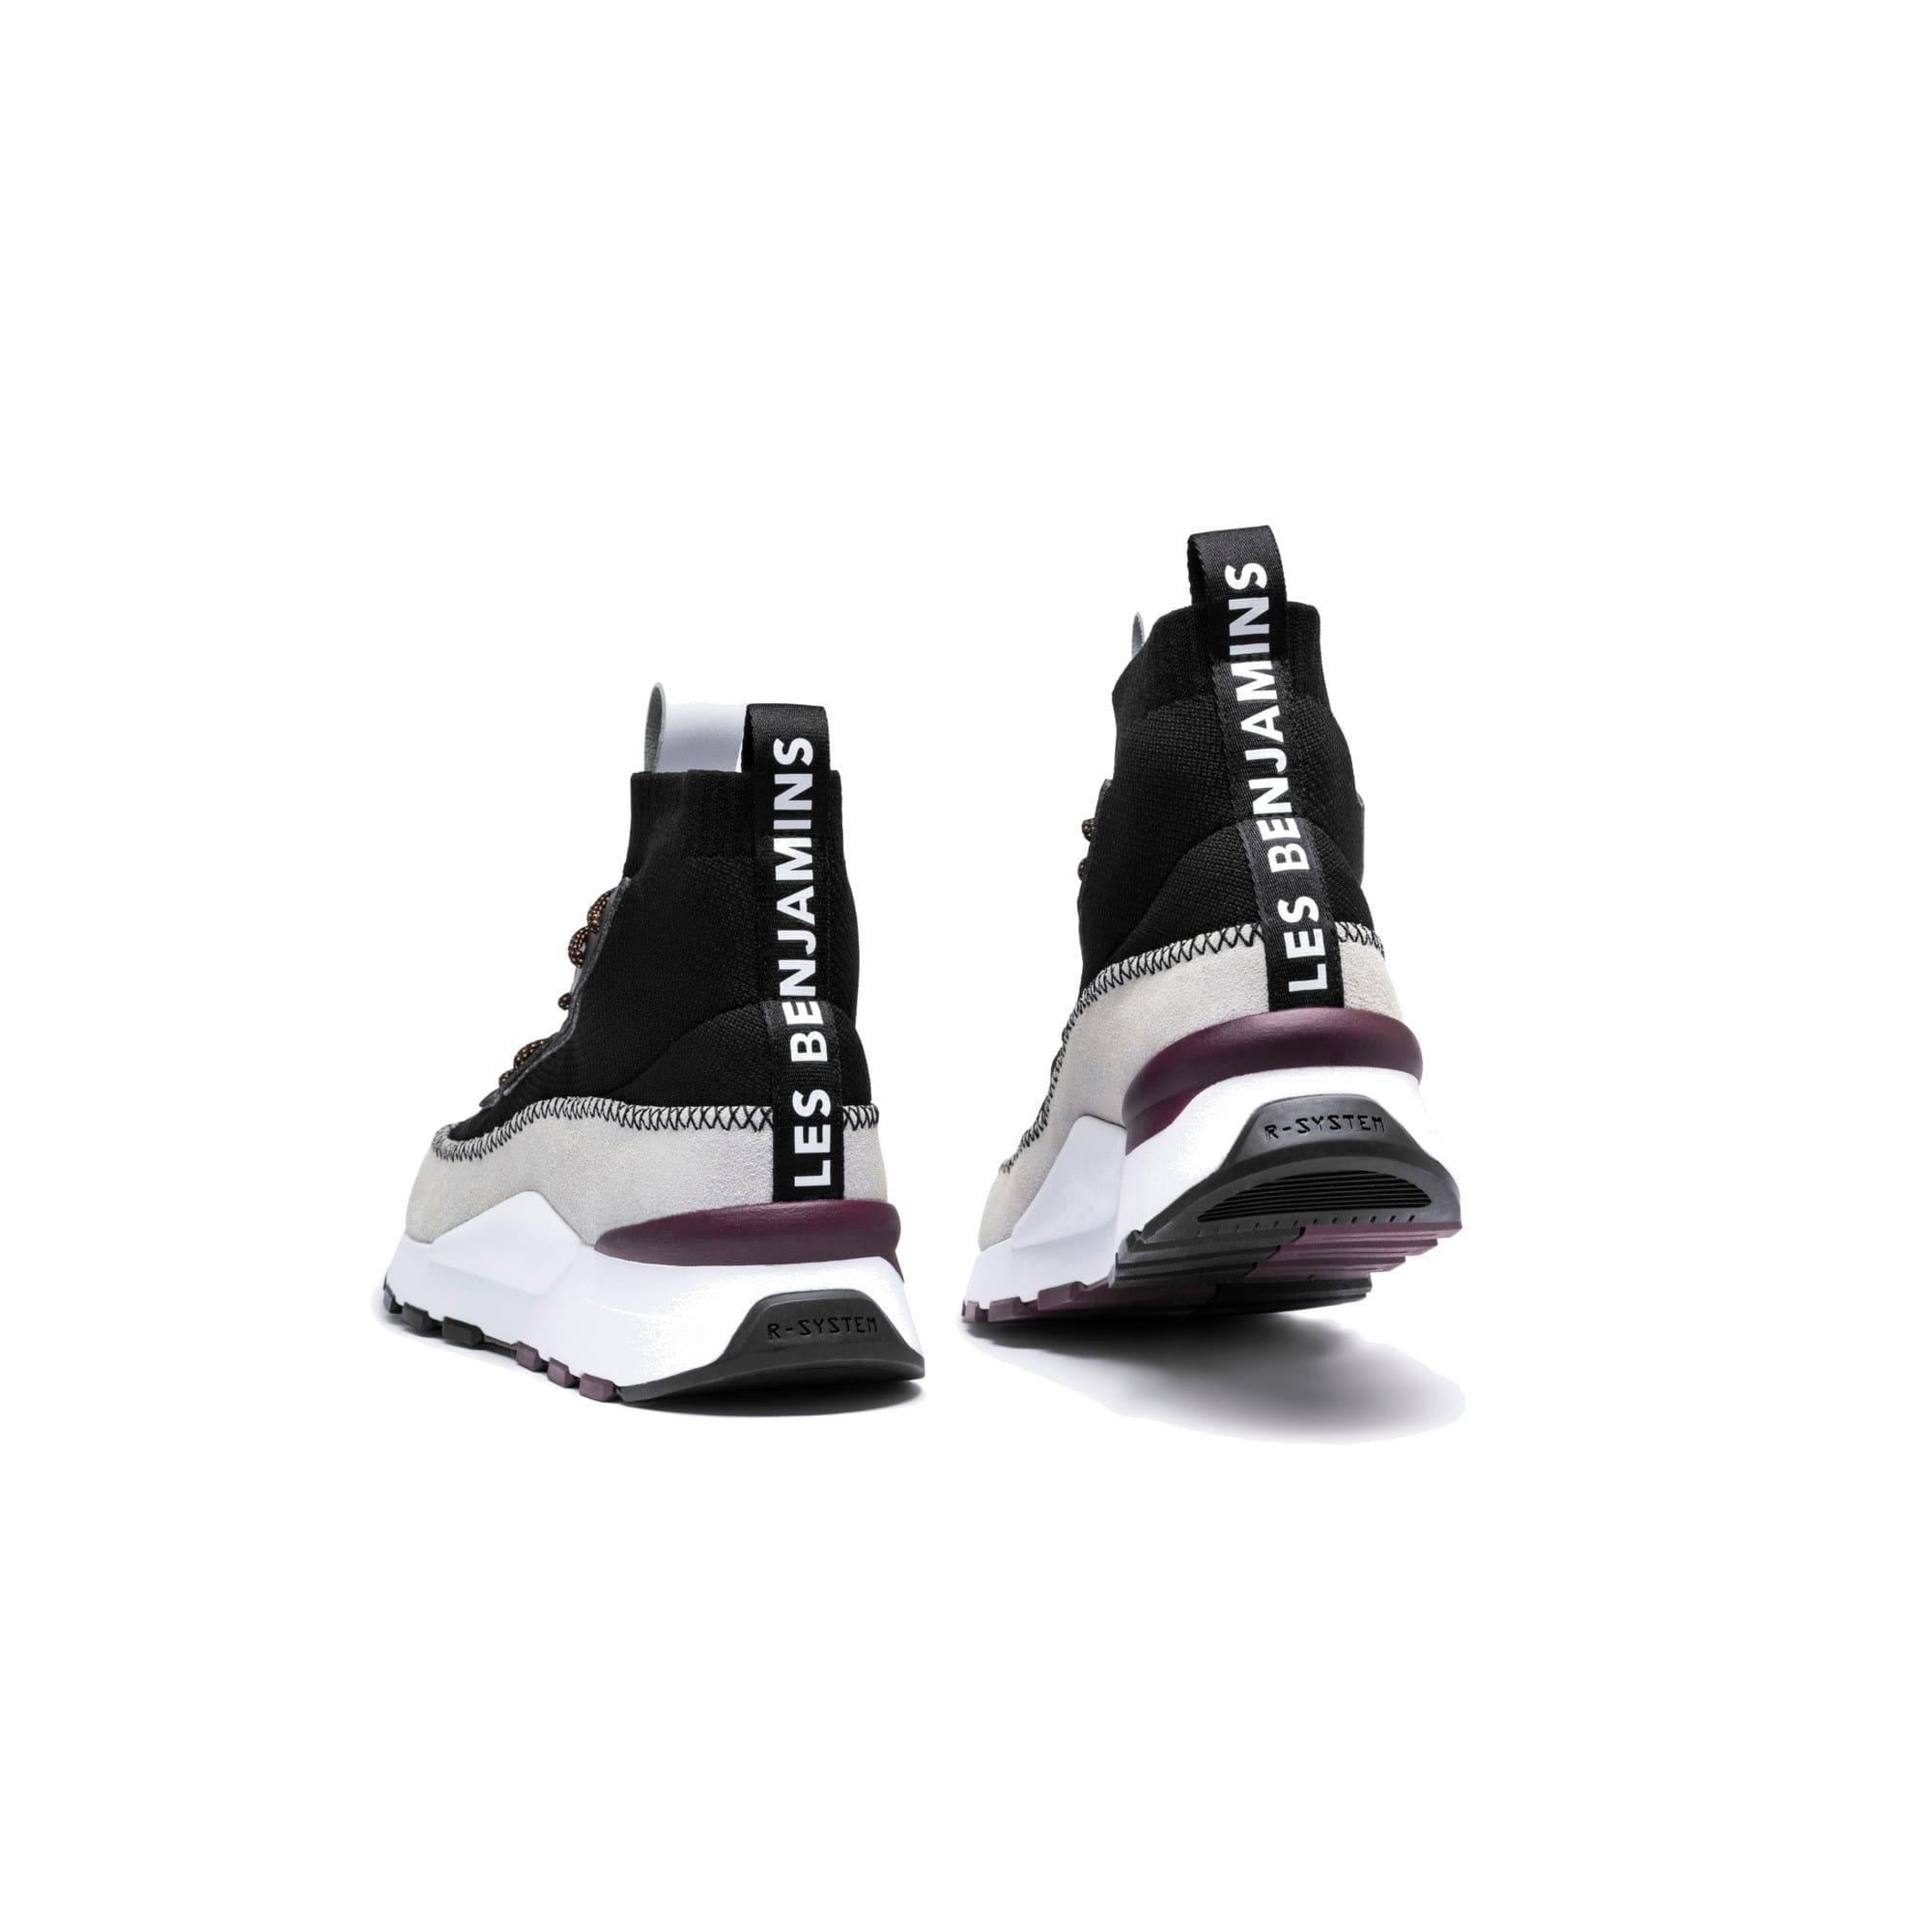 Thumbnail 10 of RS-0 LES BENJAMINS Sneakers, Puma White-Puma Black, medium